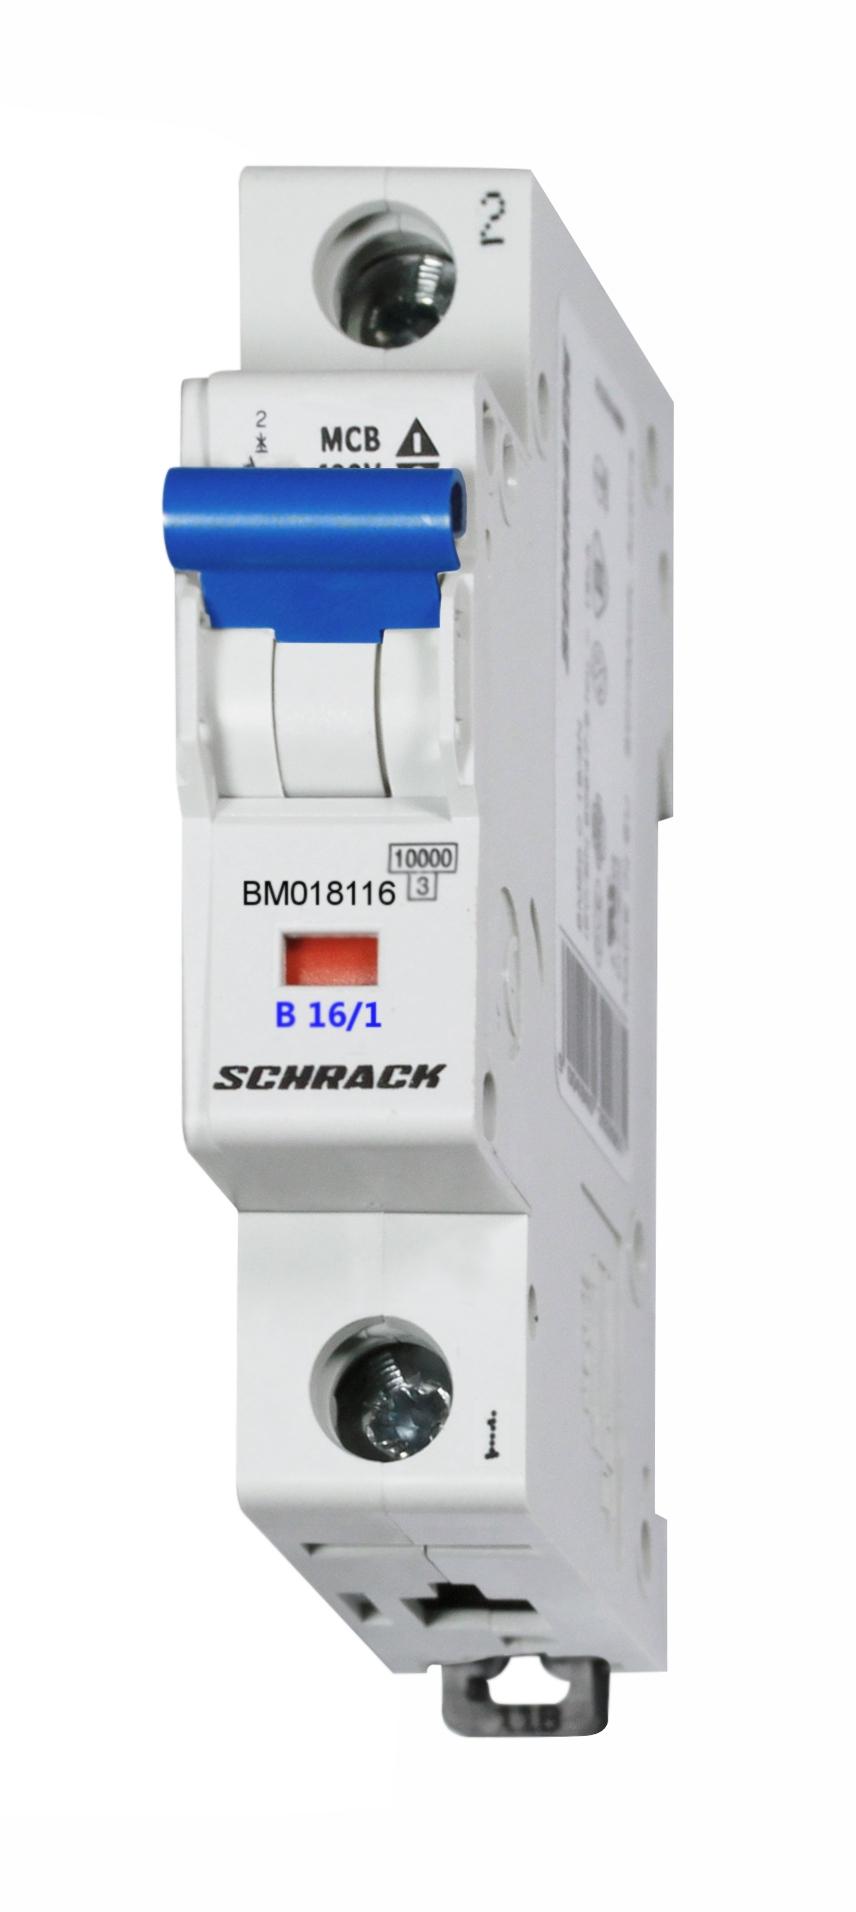 1 Stk Sicherungsautomat, Kennlinie B, 16A, 1-polig, 10kA BM018116--